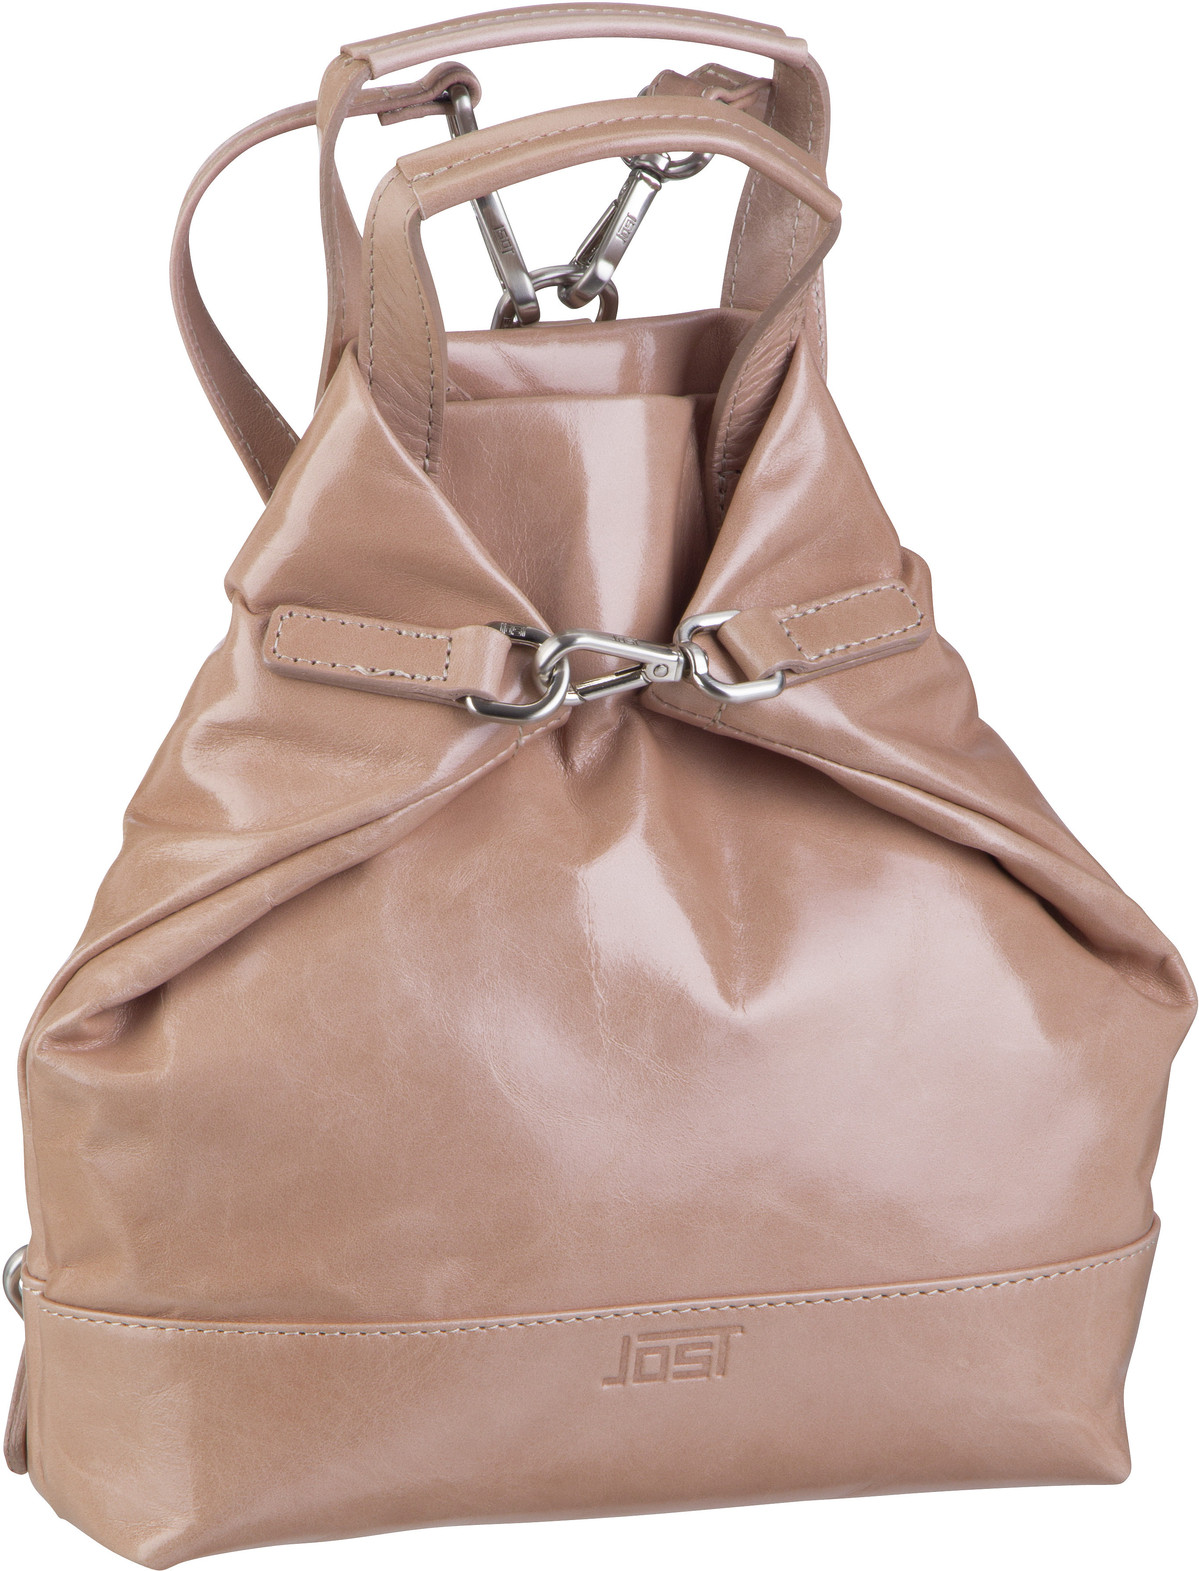 Rucksack / Daypack Boda 6617 X-Change Bag Mini Rosewood